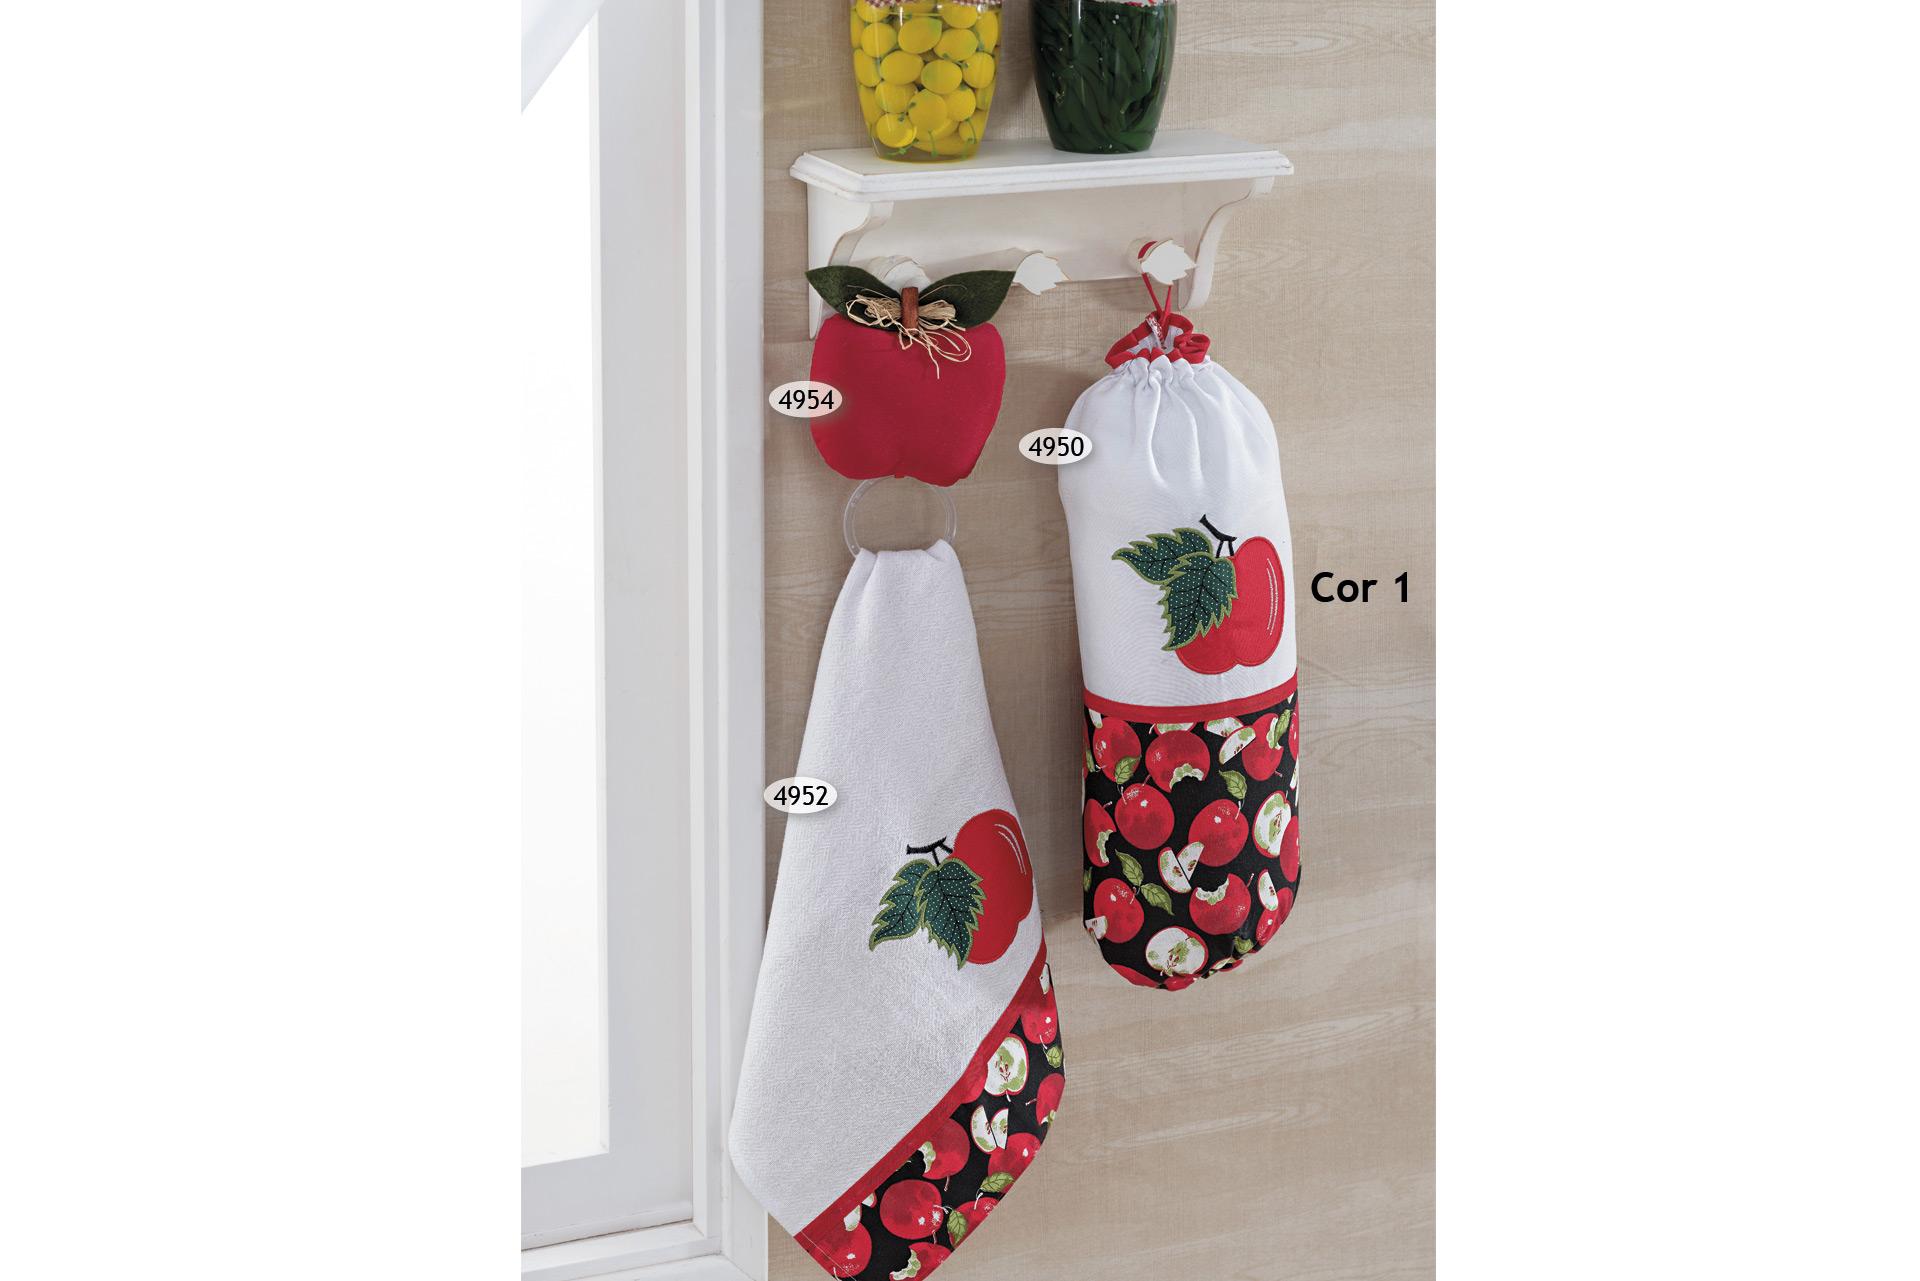 Cod. 4950 - 4952 - 4954 - Acessórios de Cozinha Mimo - Cor 1